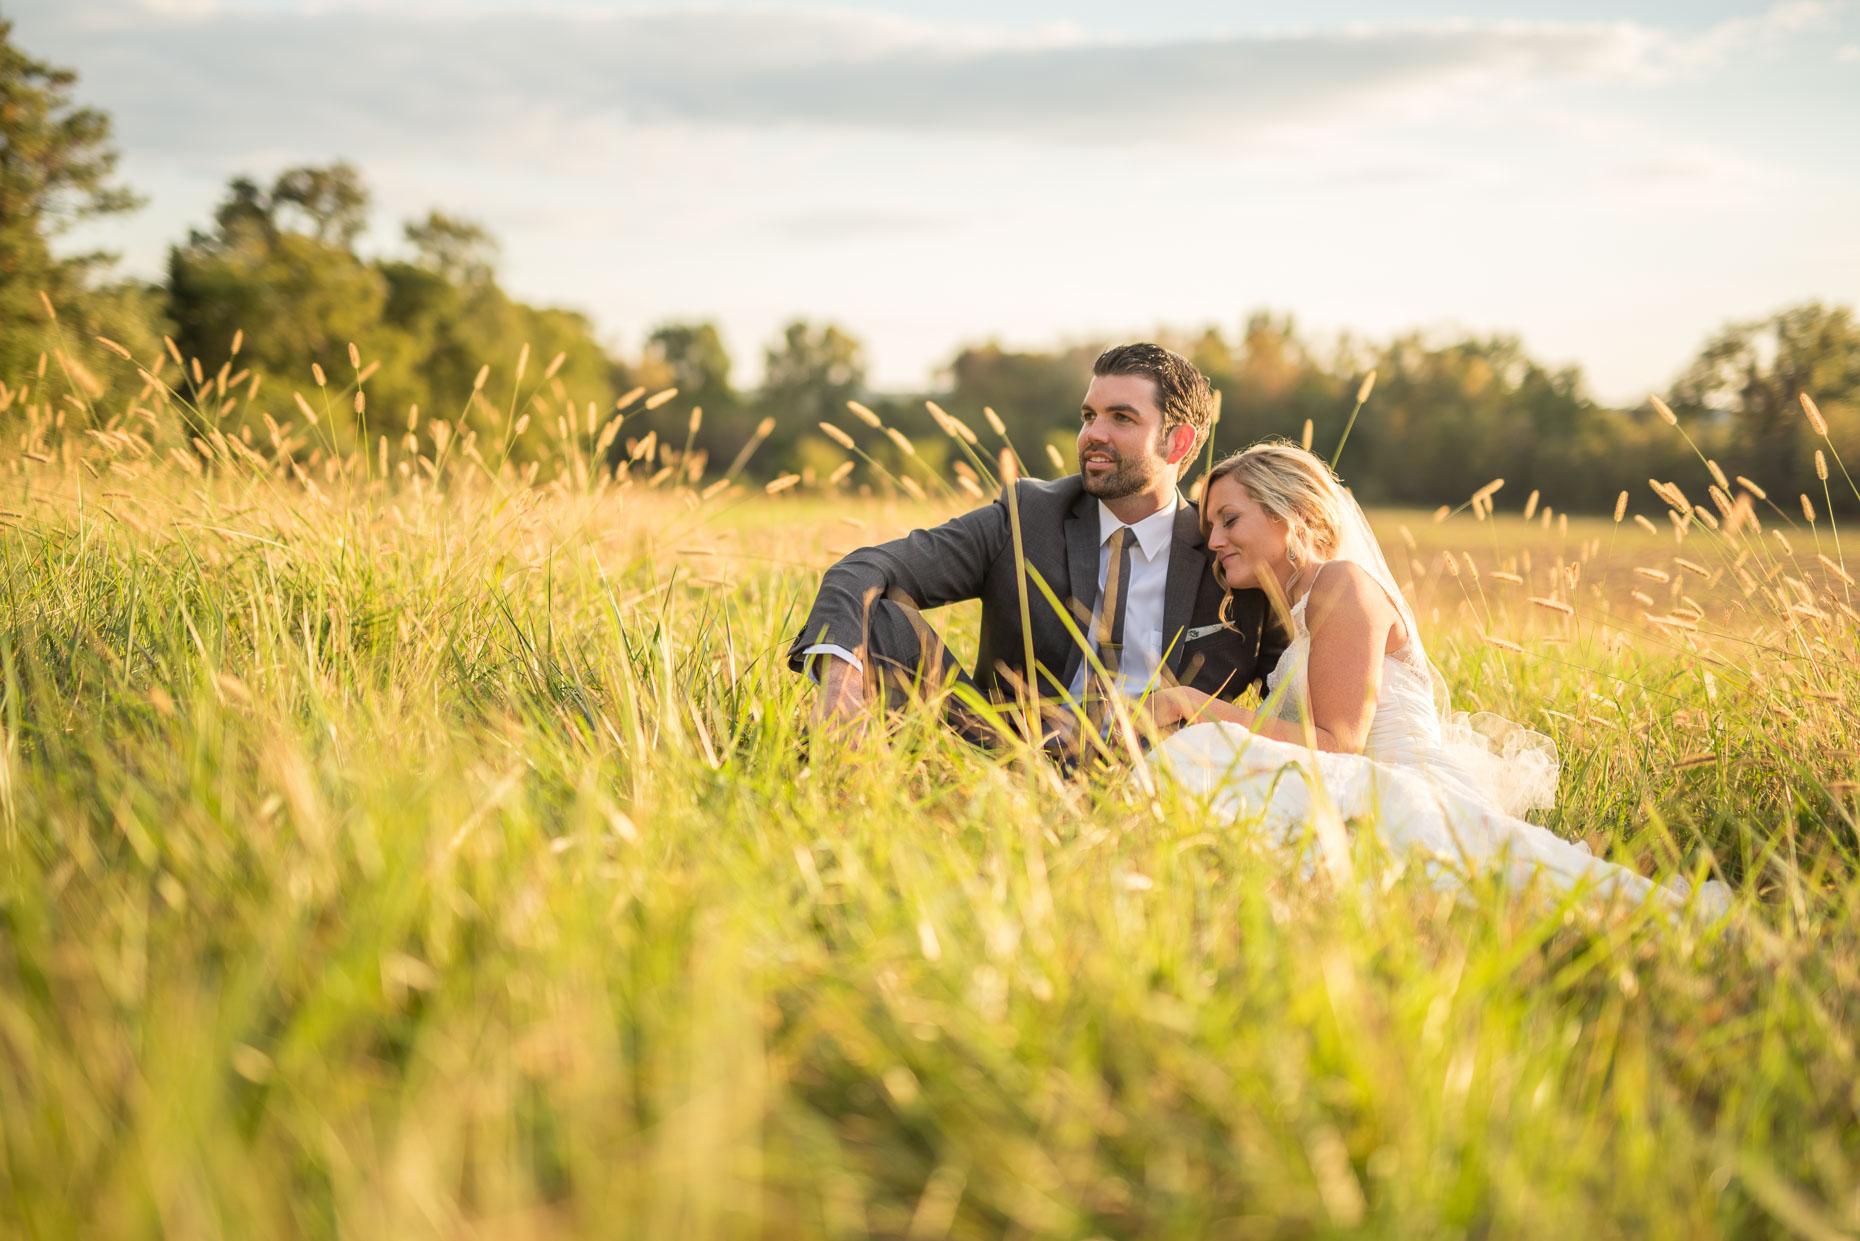 Weddings by Elliott O'Donovan - Washington DC_-30.jpg